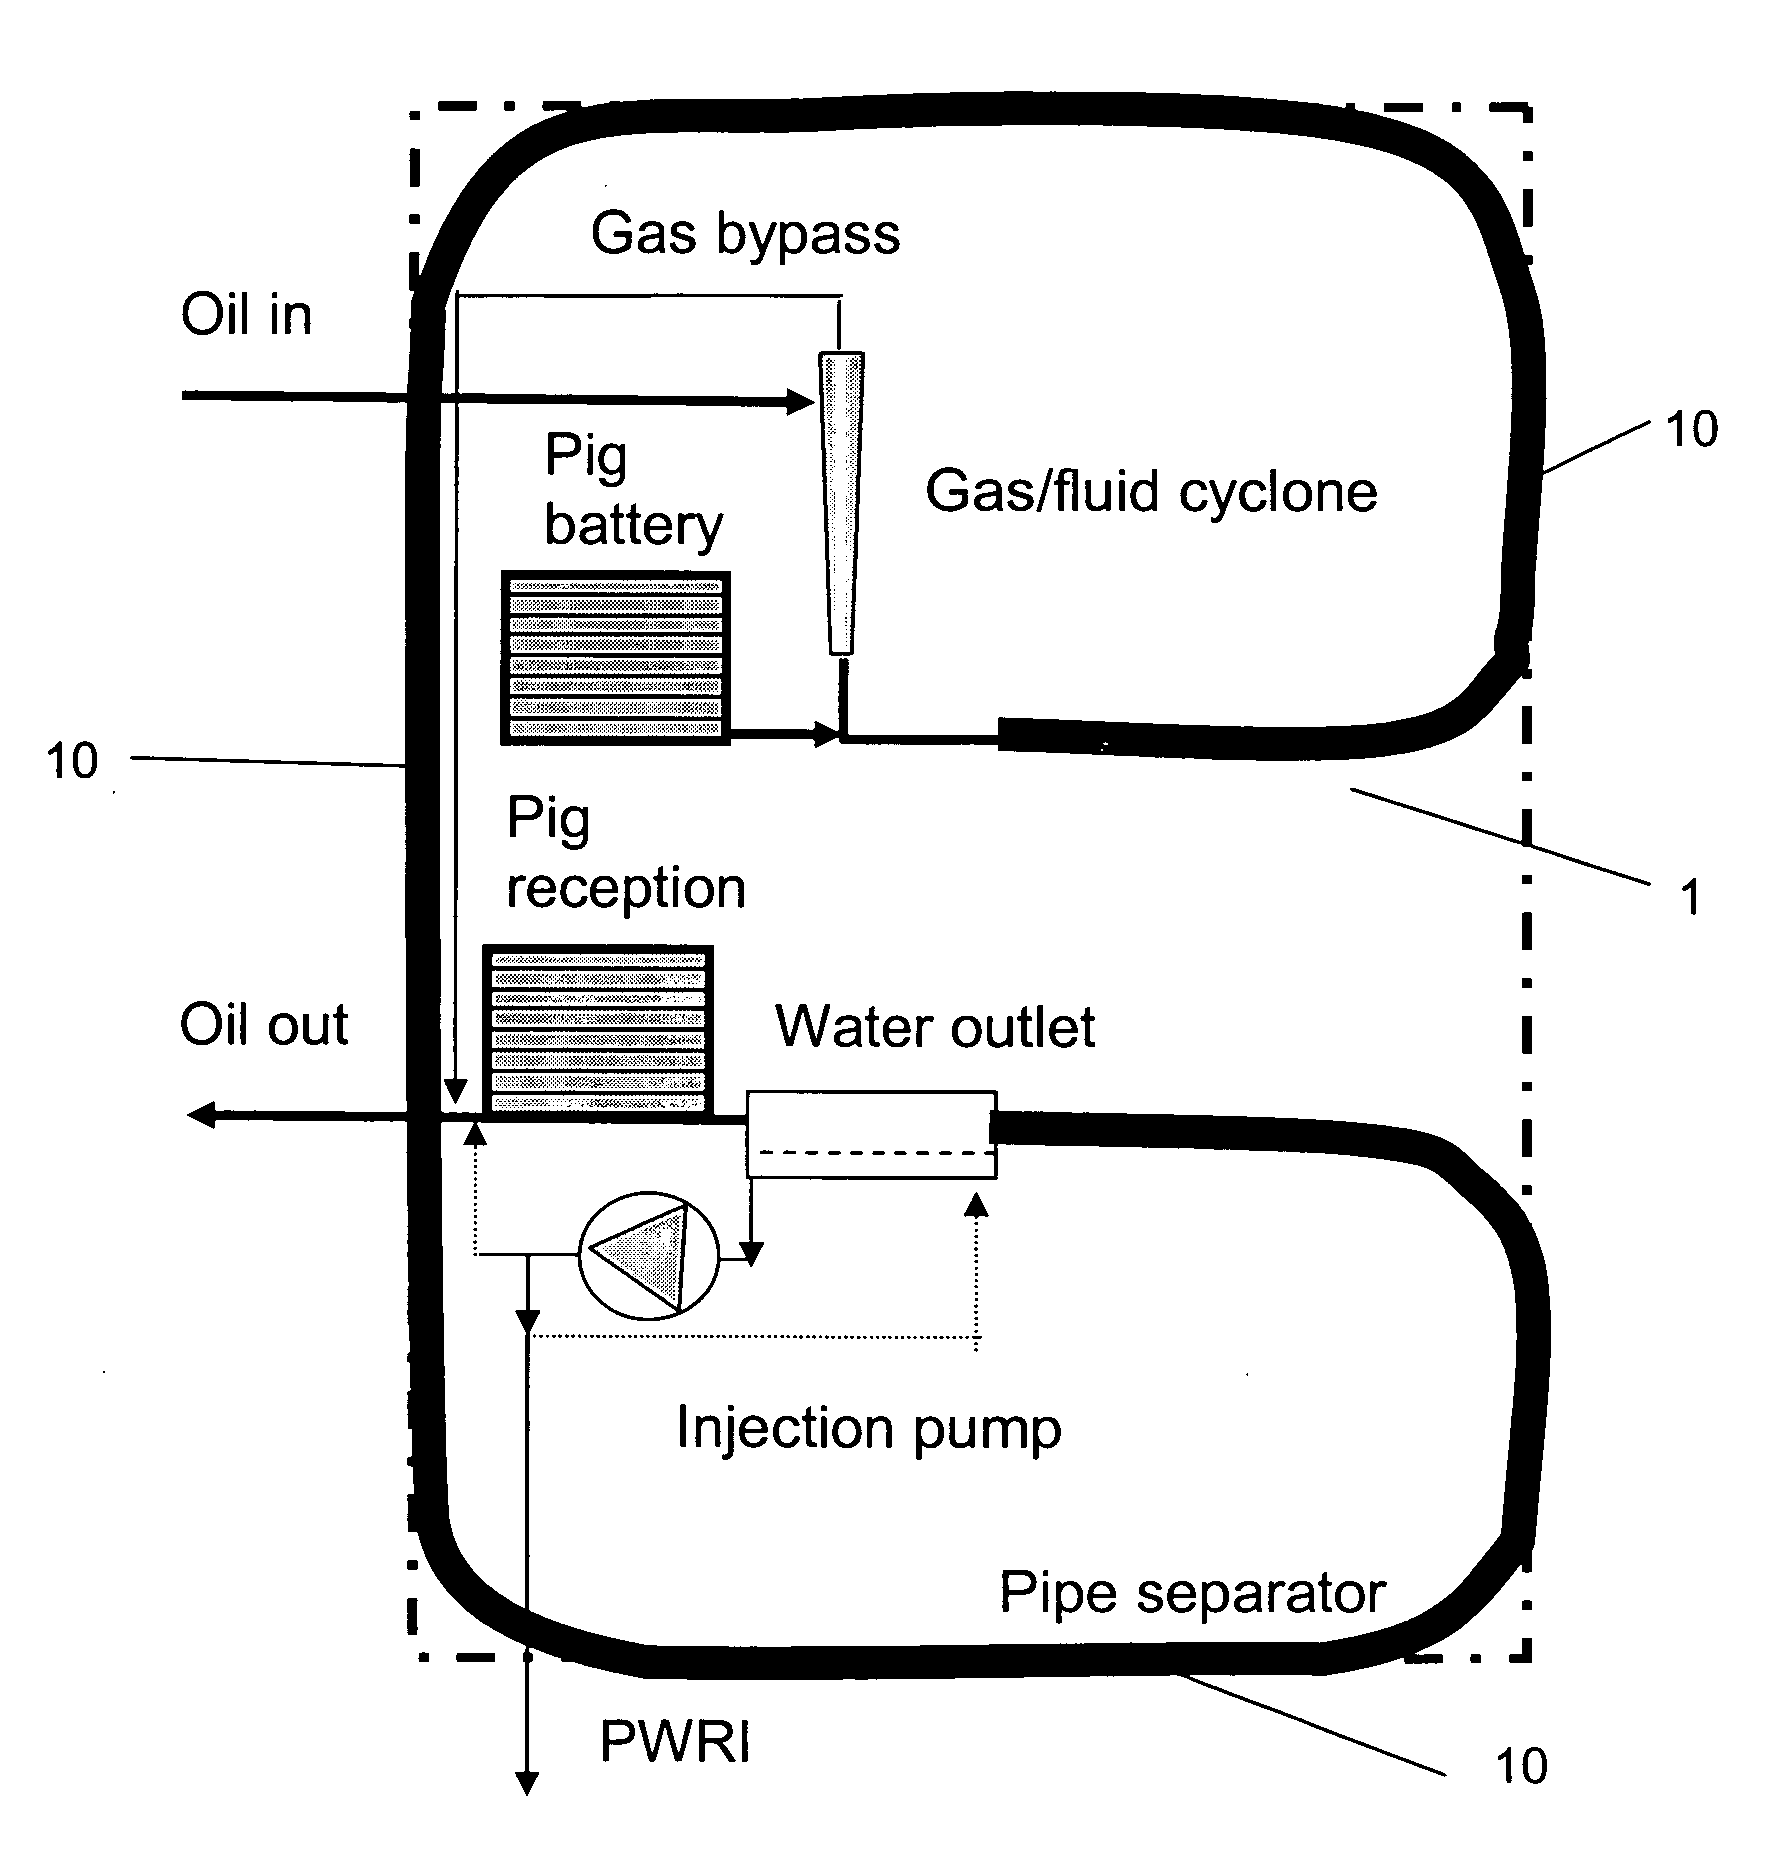 patent us20090145832 - pipe separator